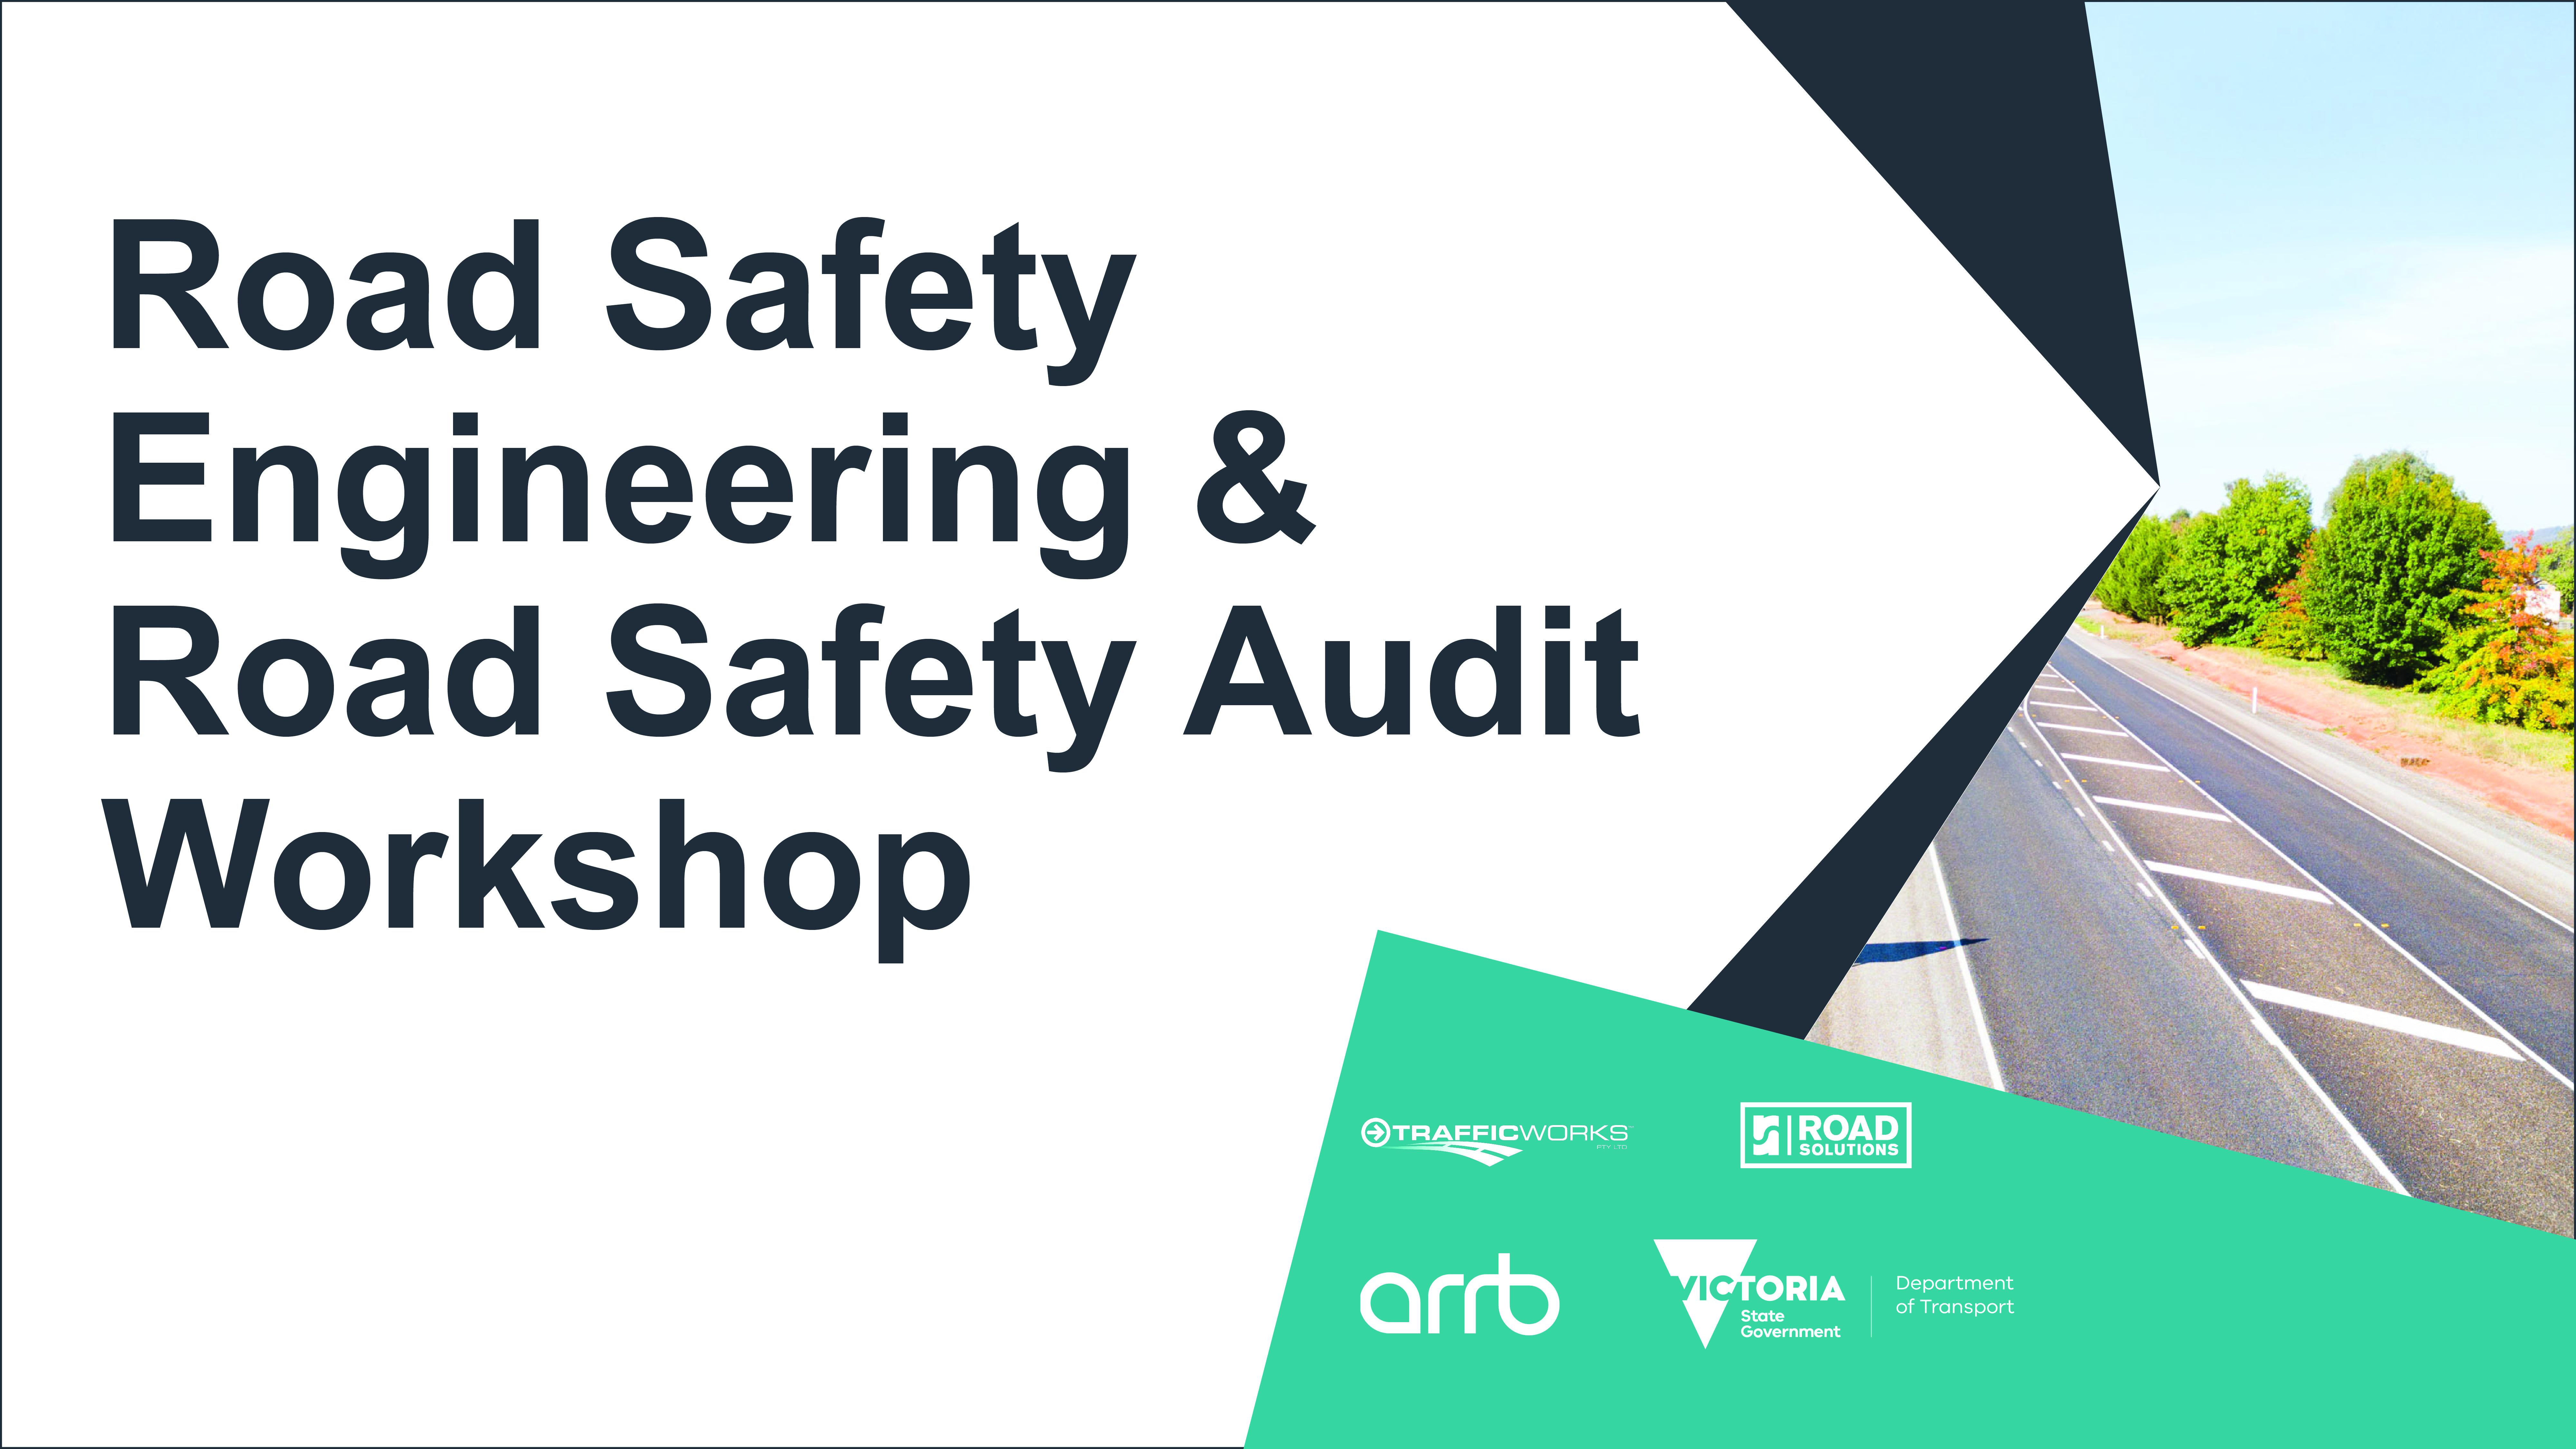 DoT Road Safety Engineering & Road Safety Audit October